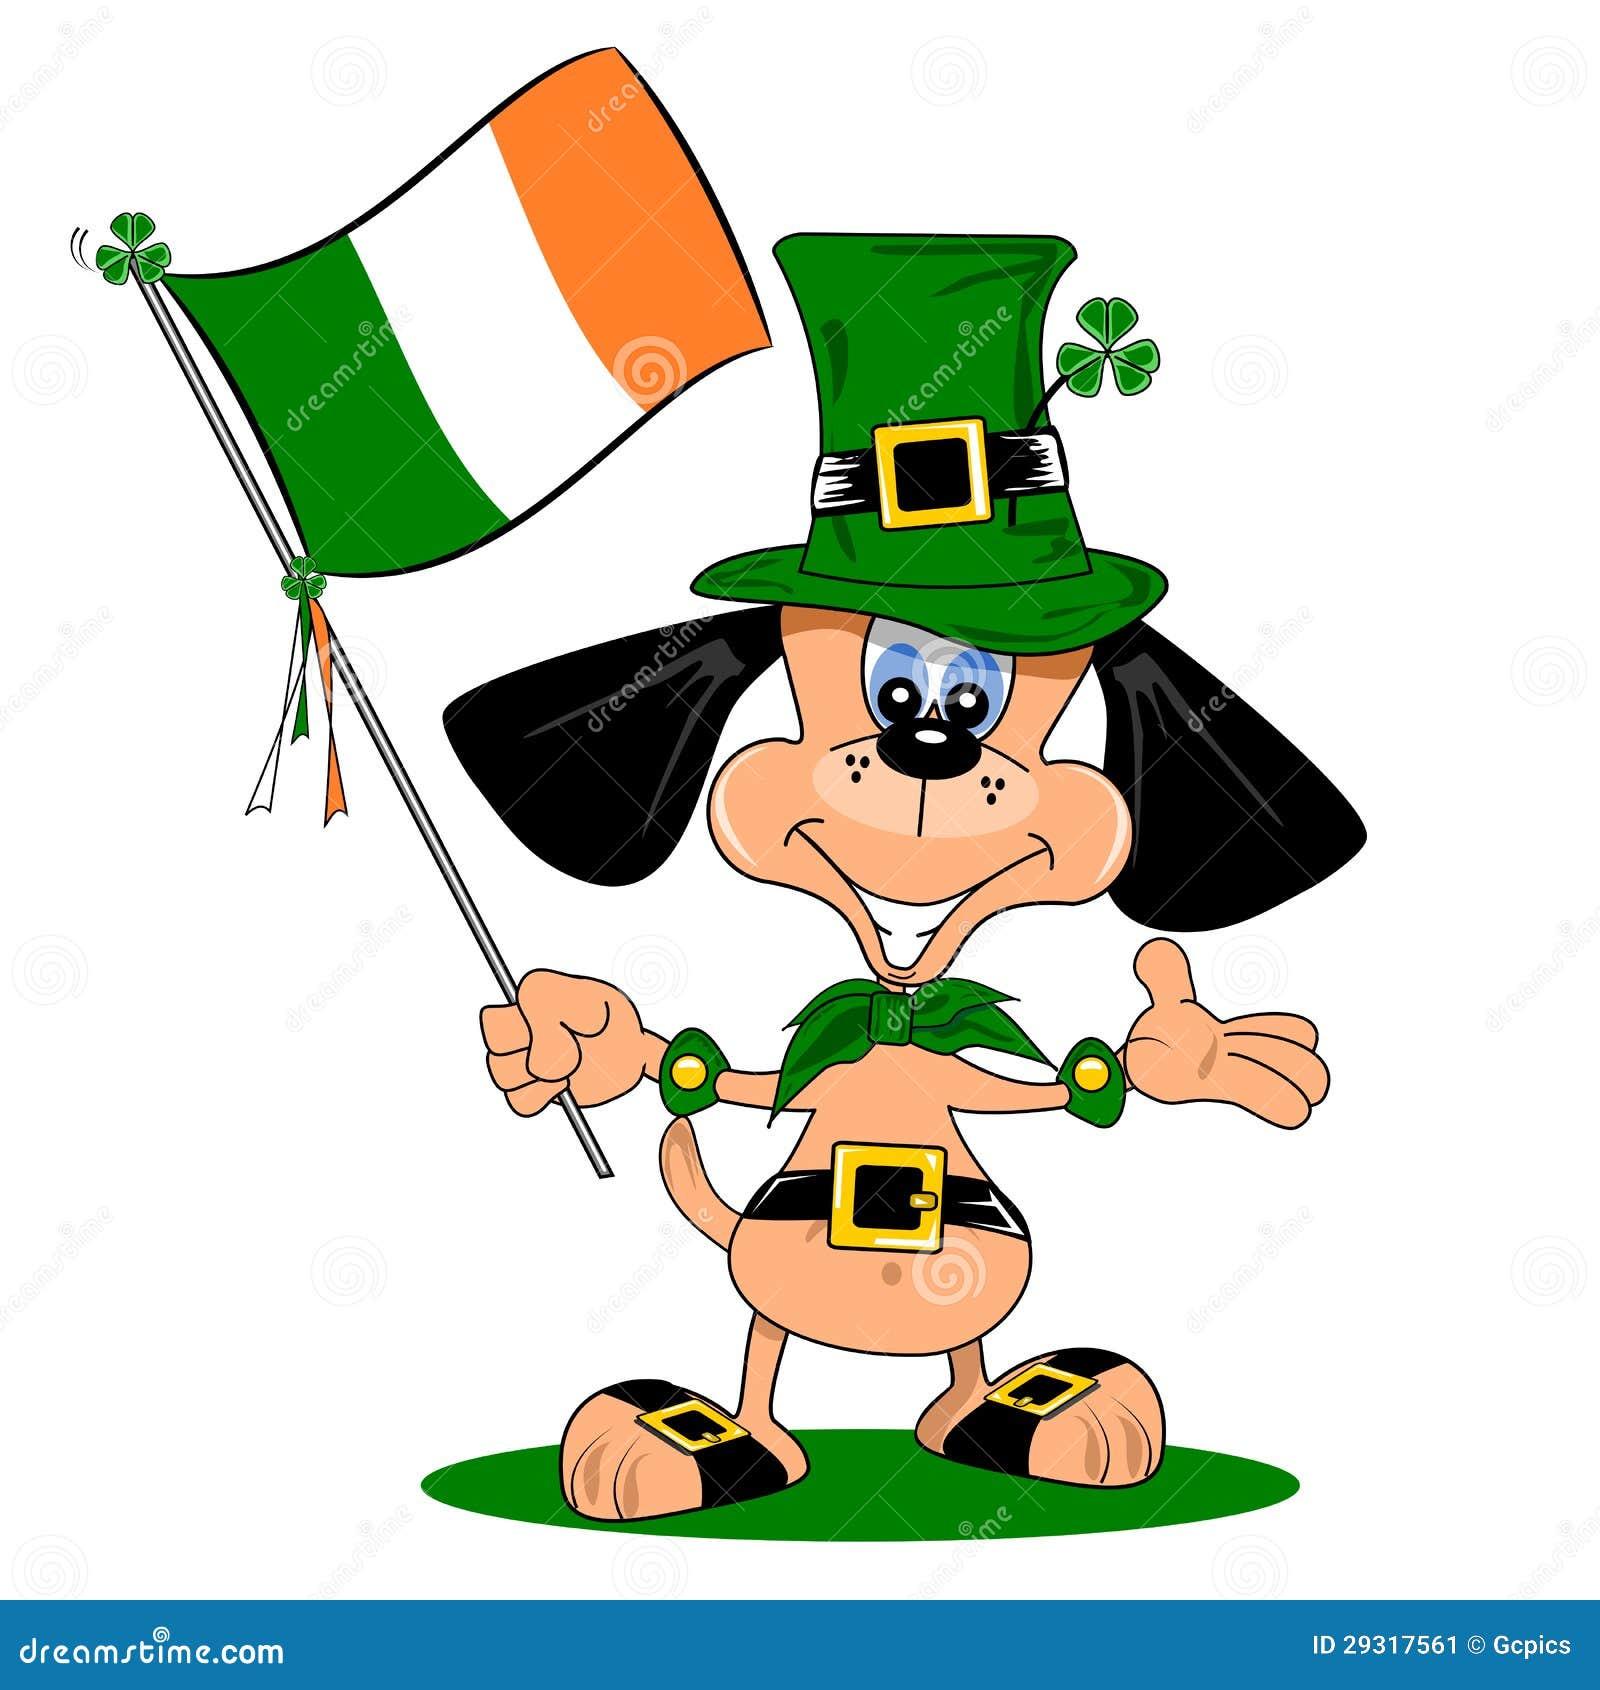 A Cartoon Dog On St Patricks Day Stock Image - Image: 29317561